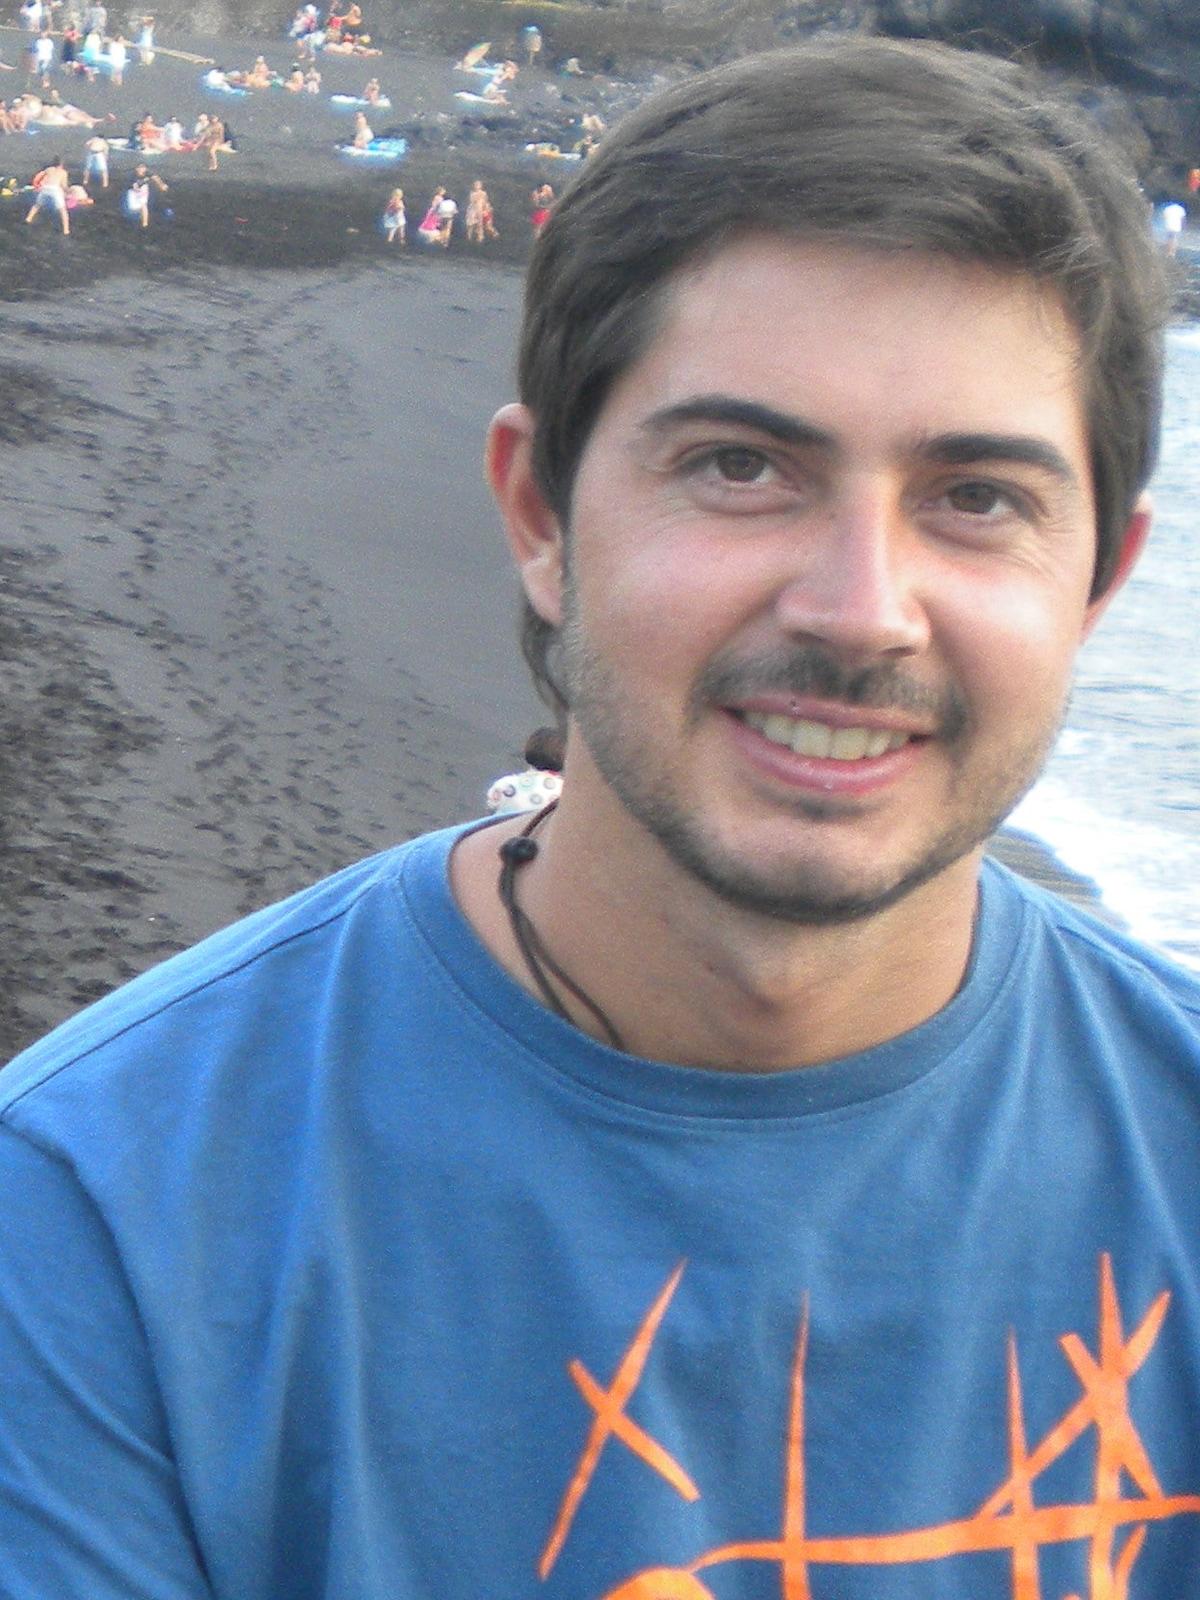 Daniel from Santa Cruz de Tenerife